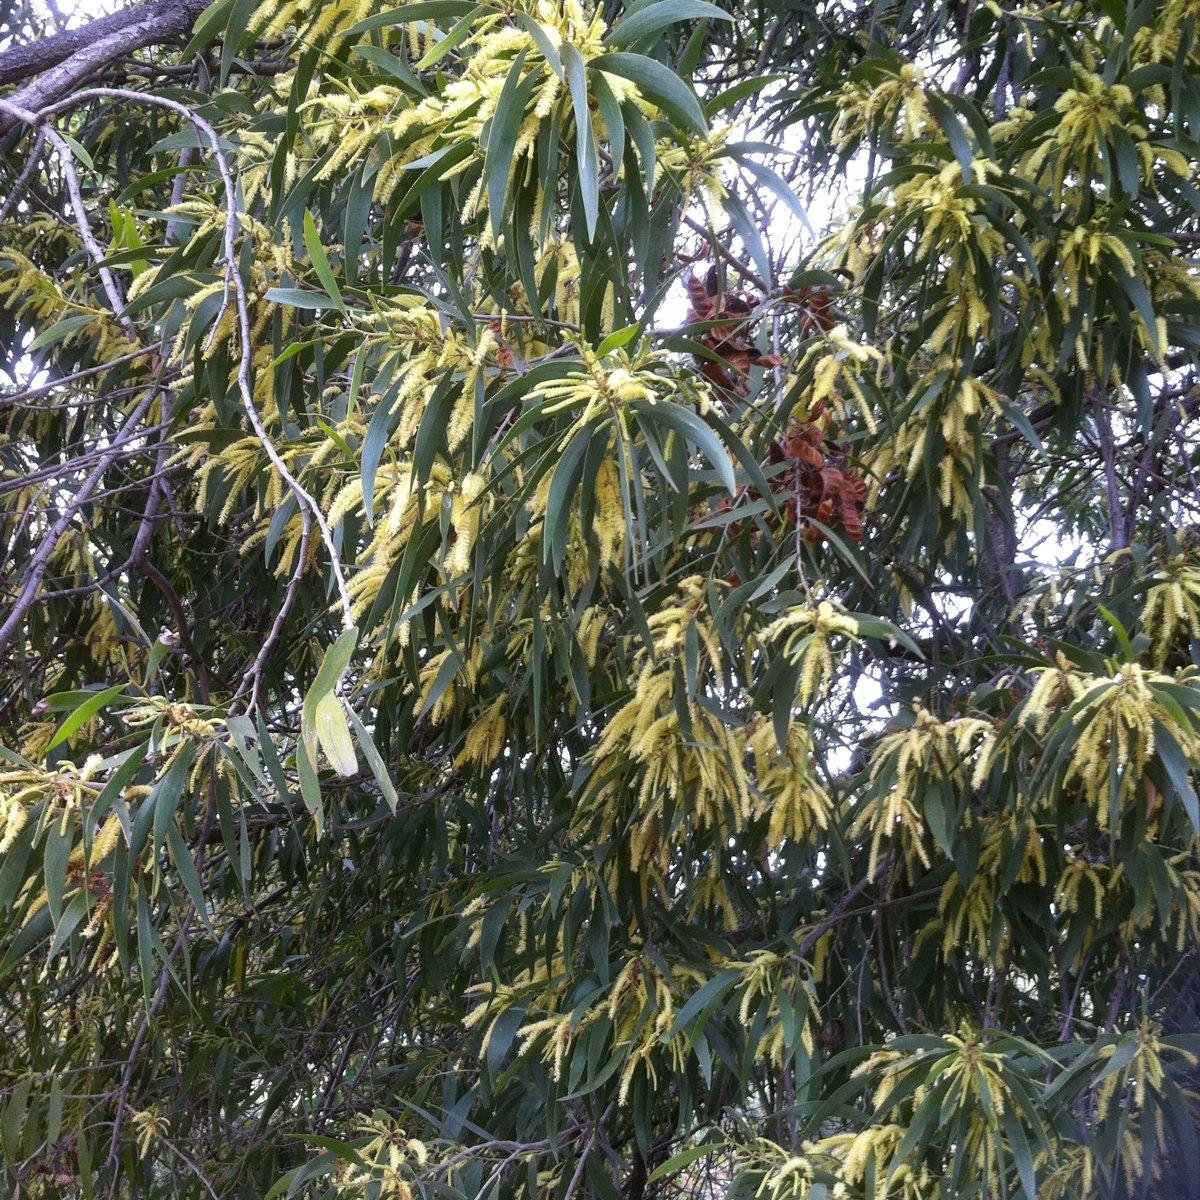 Brown salwood, Hickory wattle